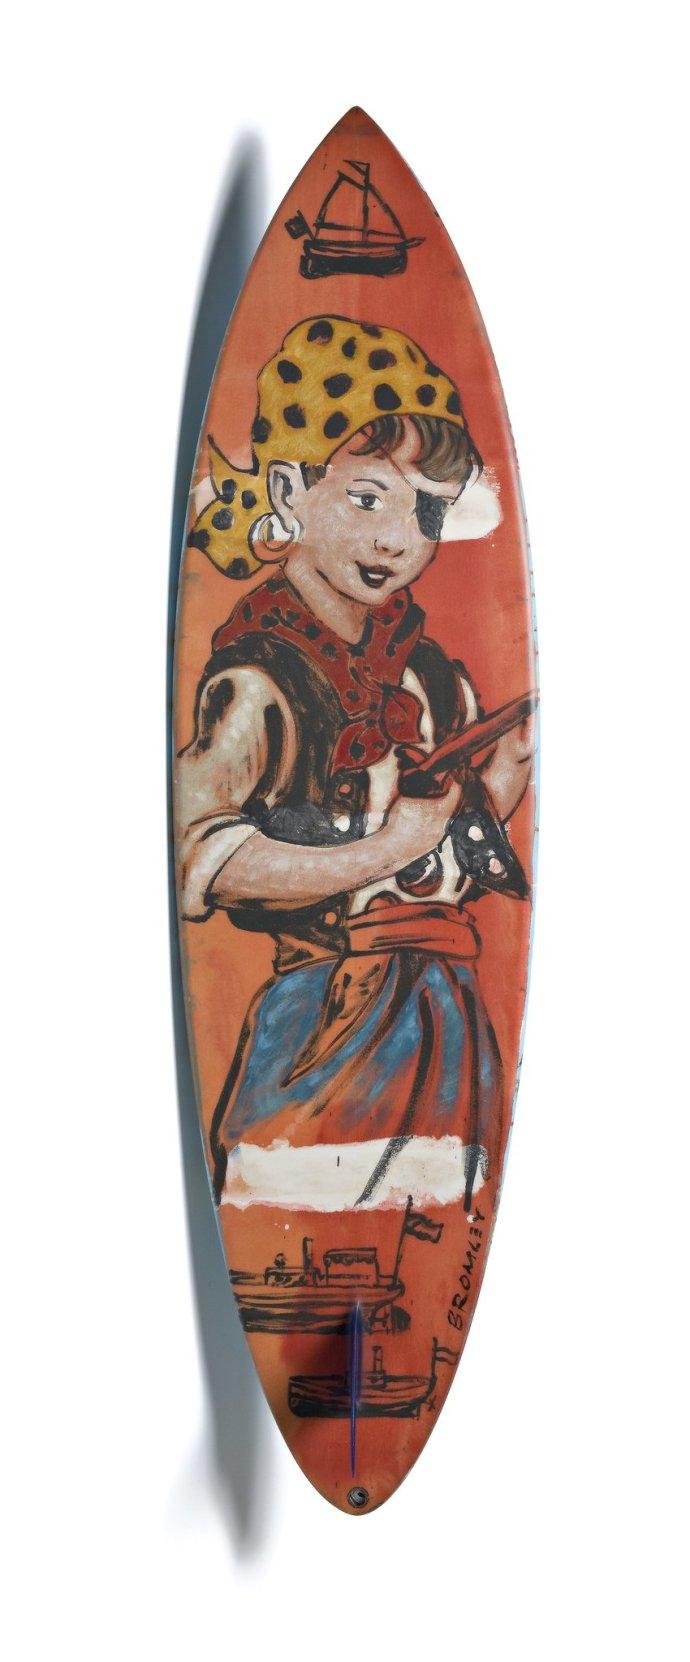 David Bromley, Surfboard